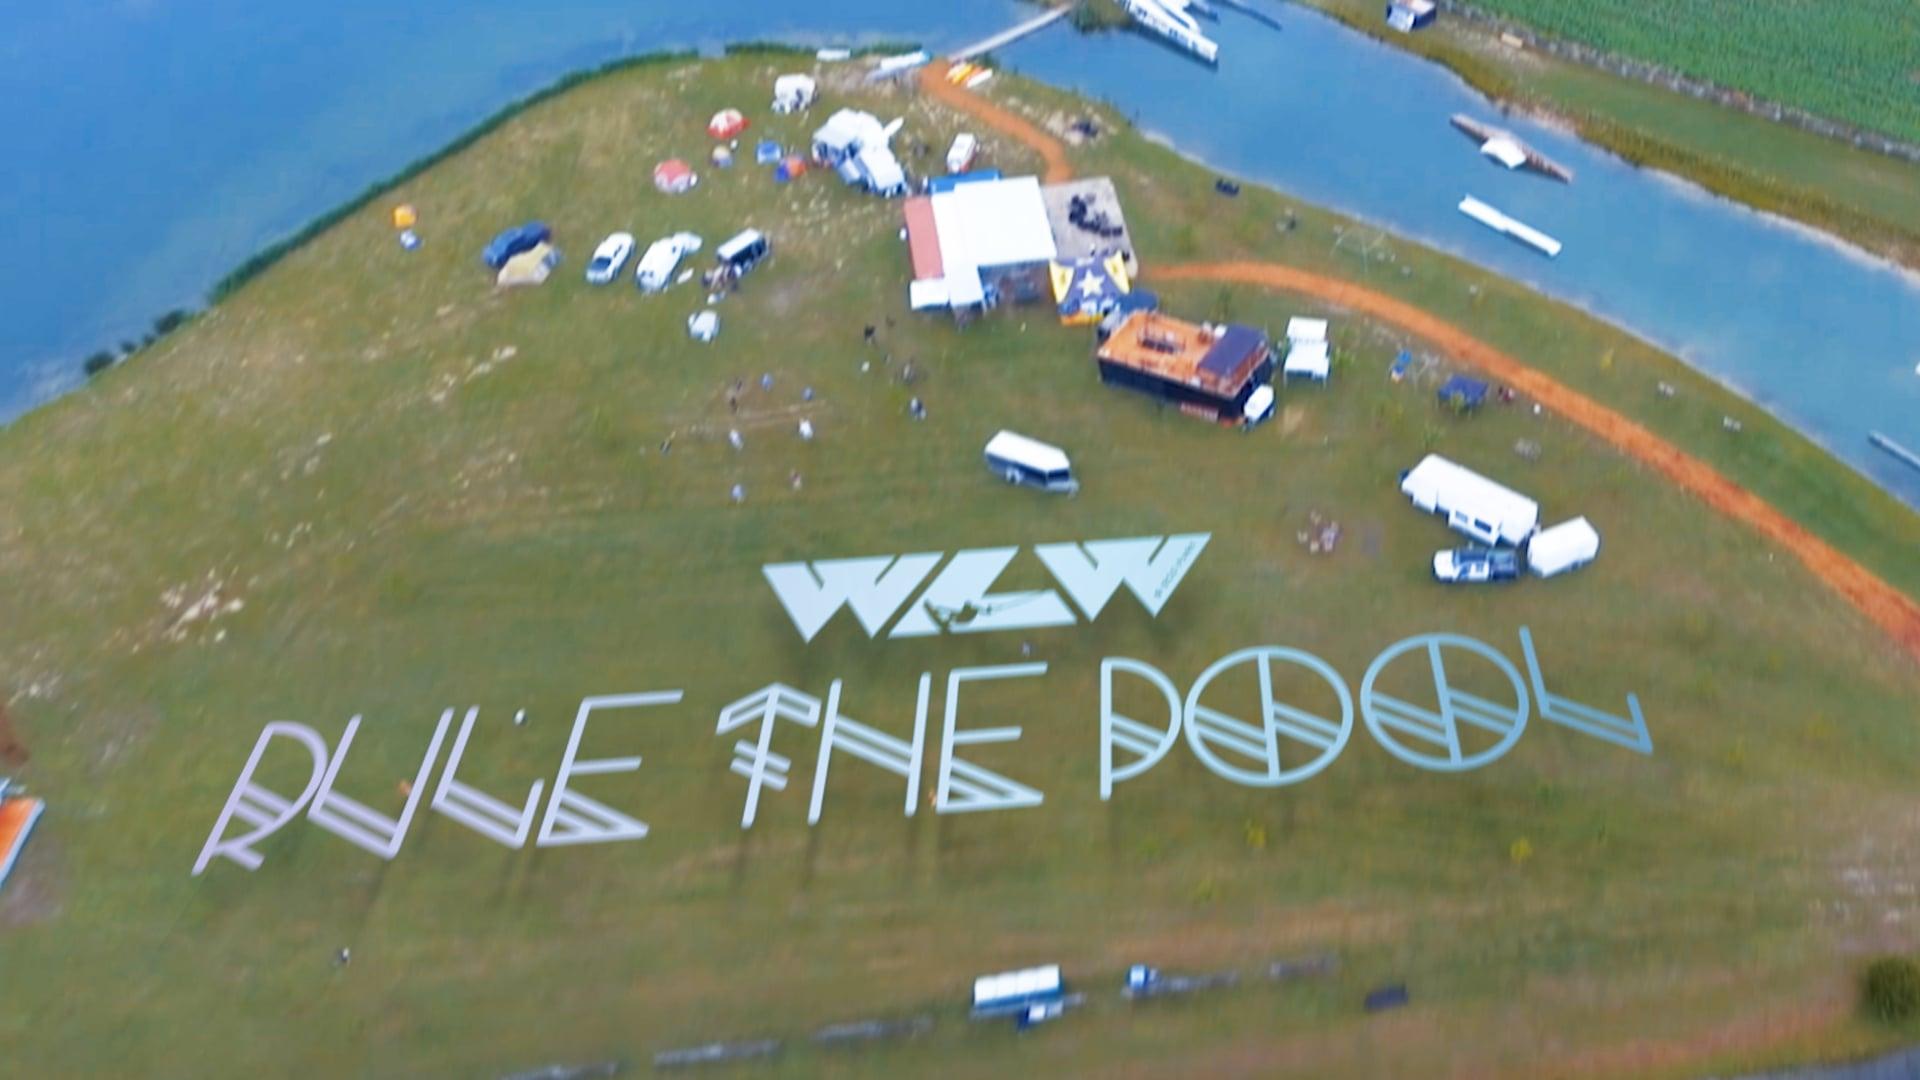 Windmill Lake's Rule The Pool 2017